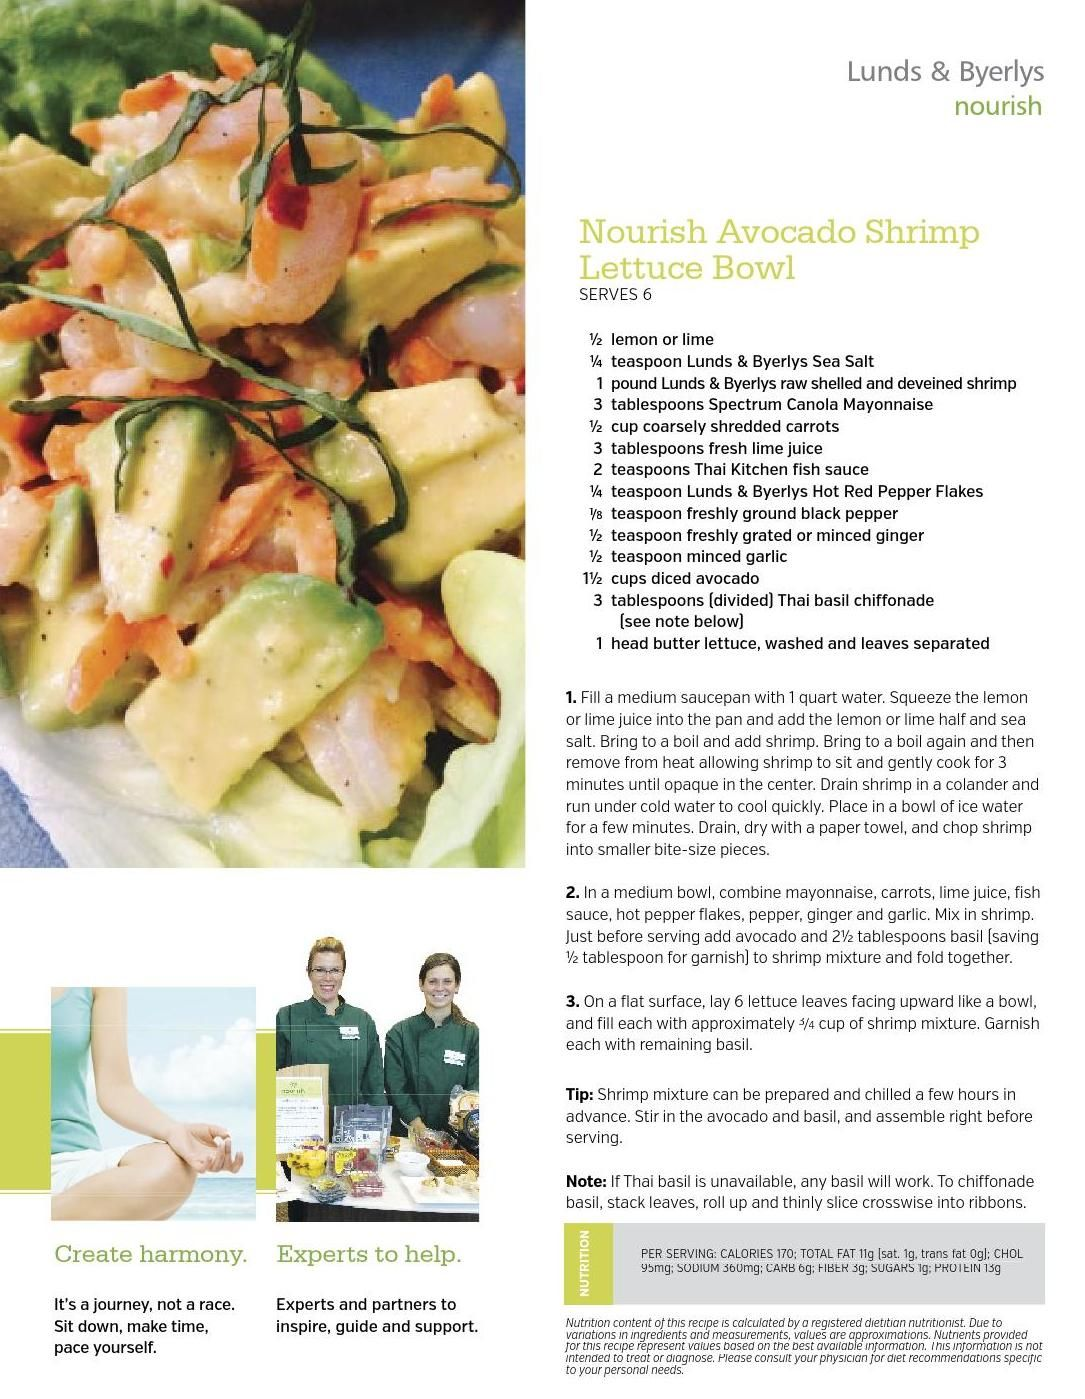 Avocado shrimp lettuce bowl